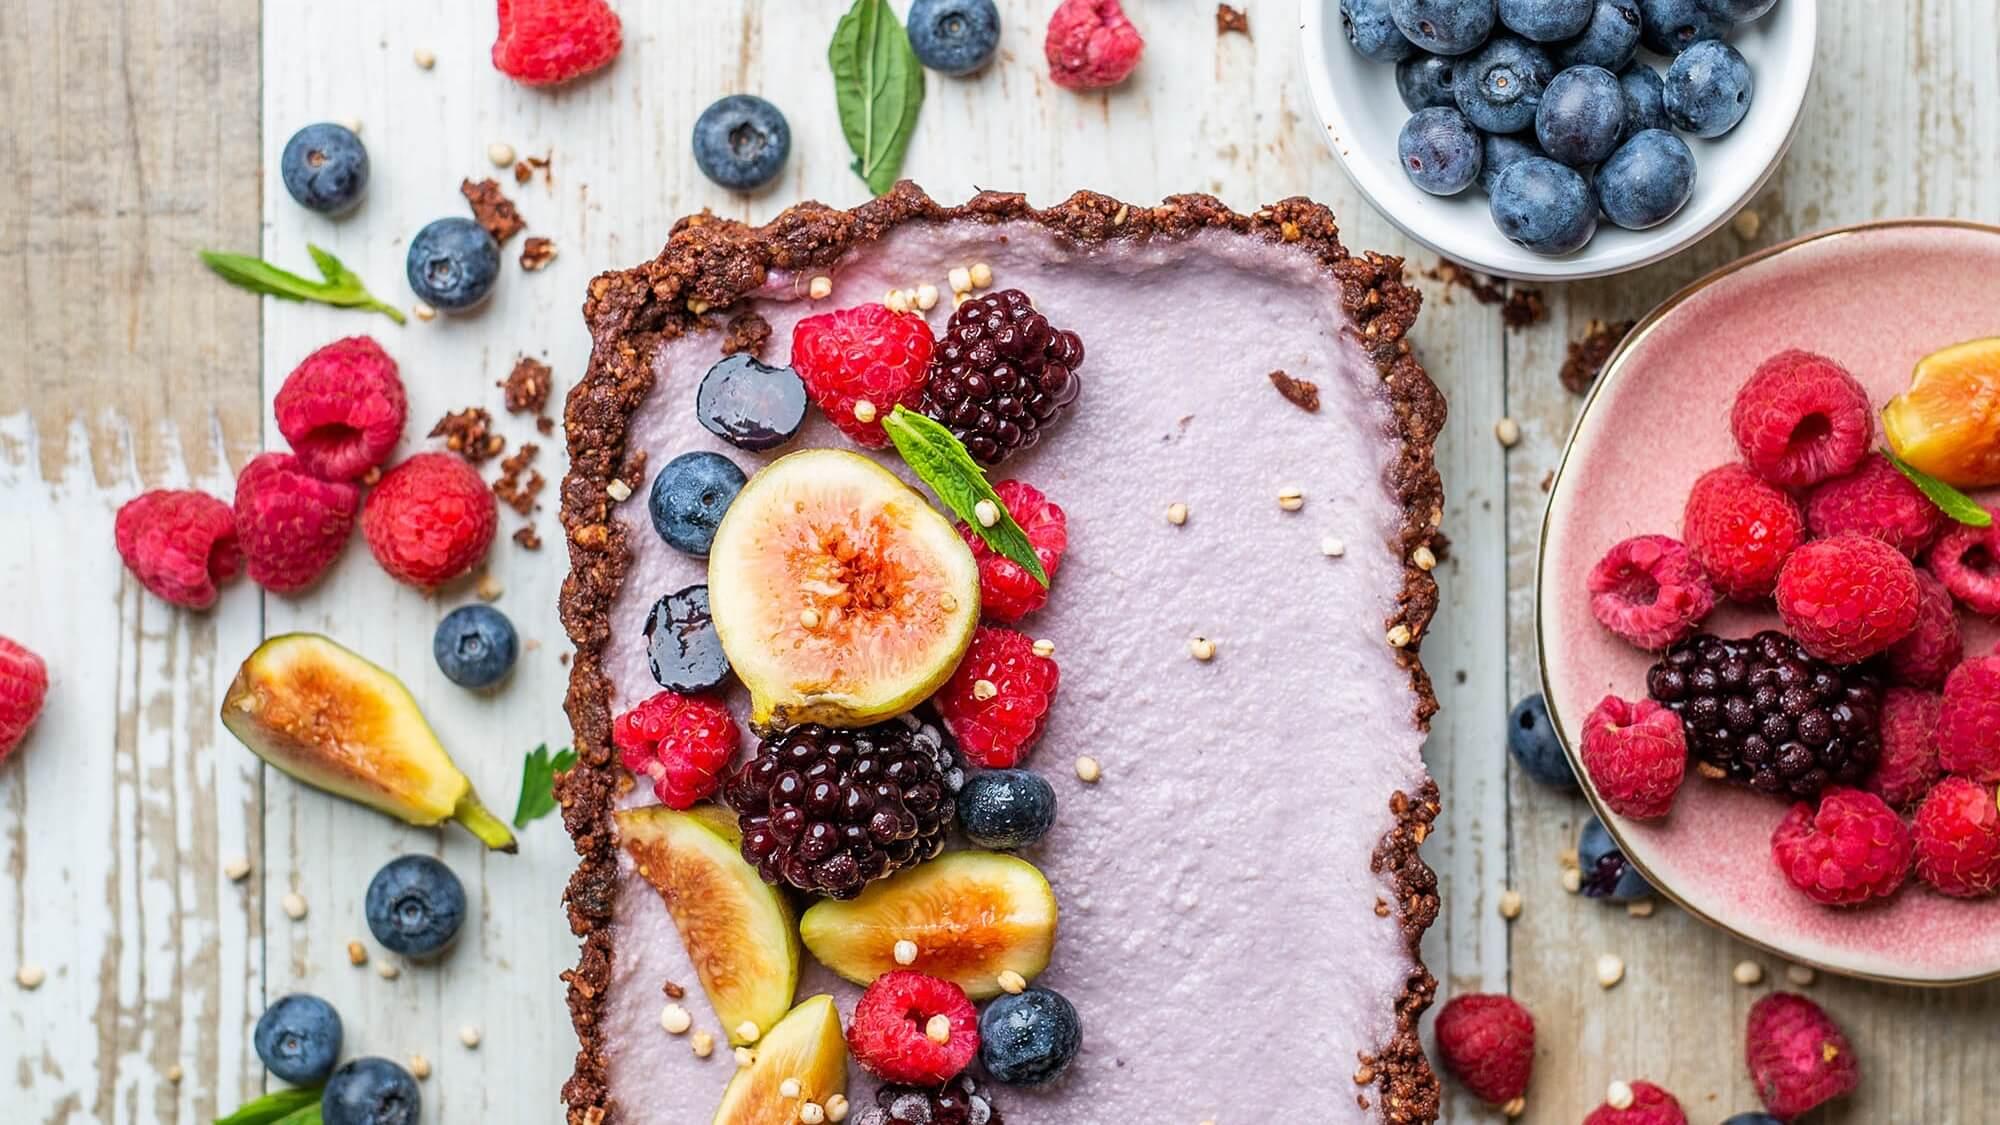 Raw Vegan Chocolate Berry Tart In a Walnut-Oat Crust